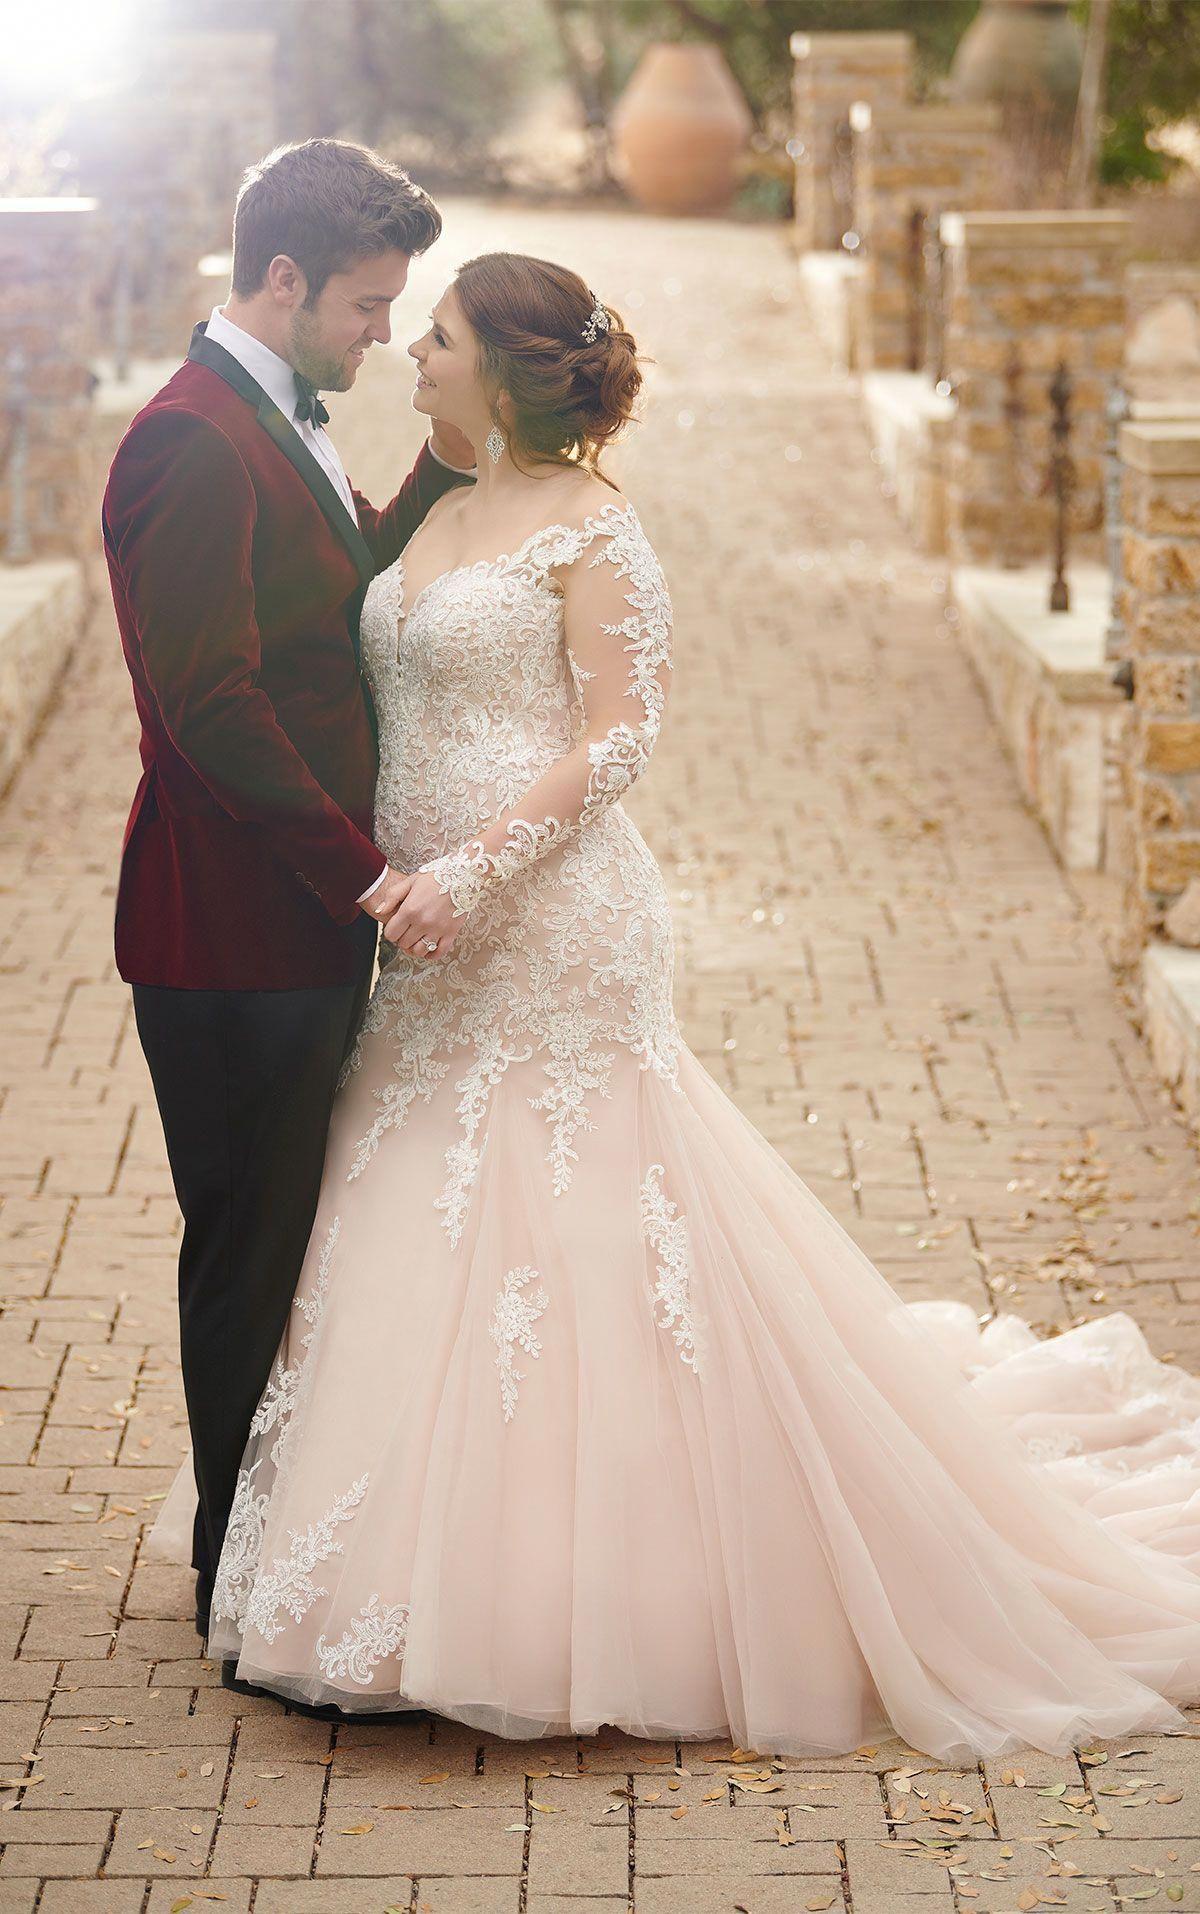 Strapless Wedding Dresses Wedding Shoes Wedding Gown